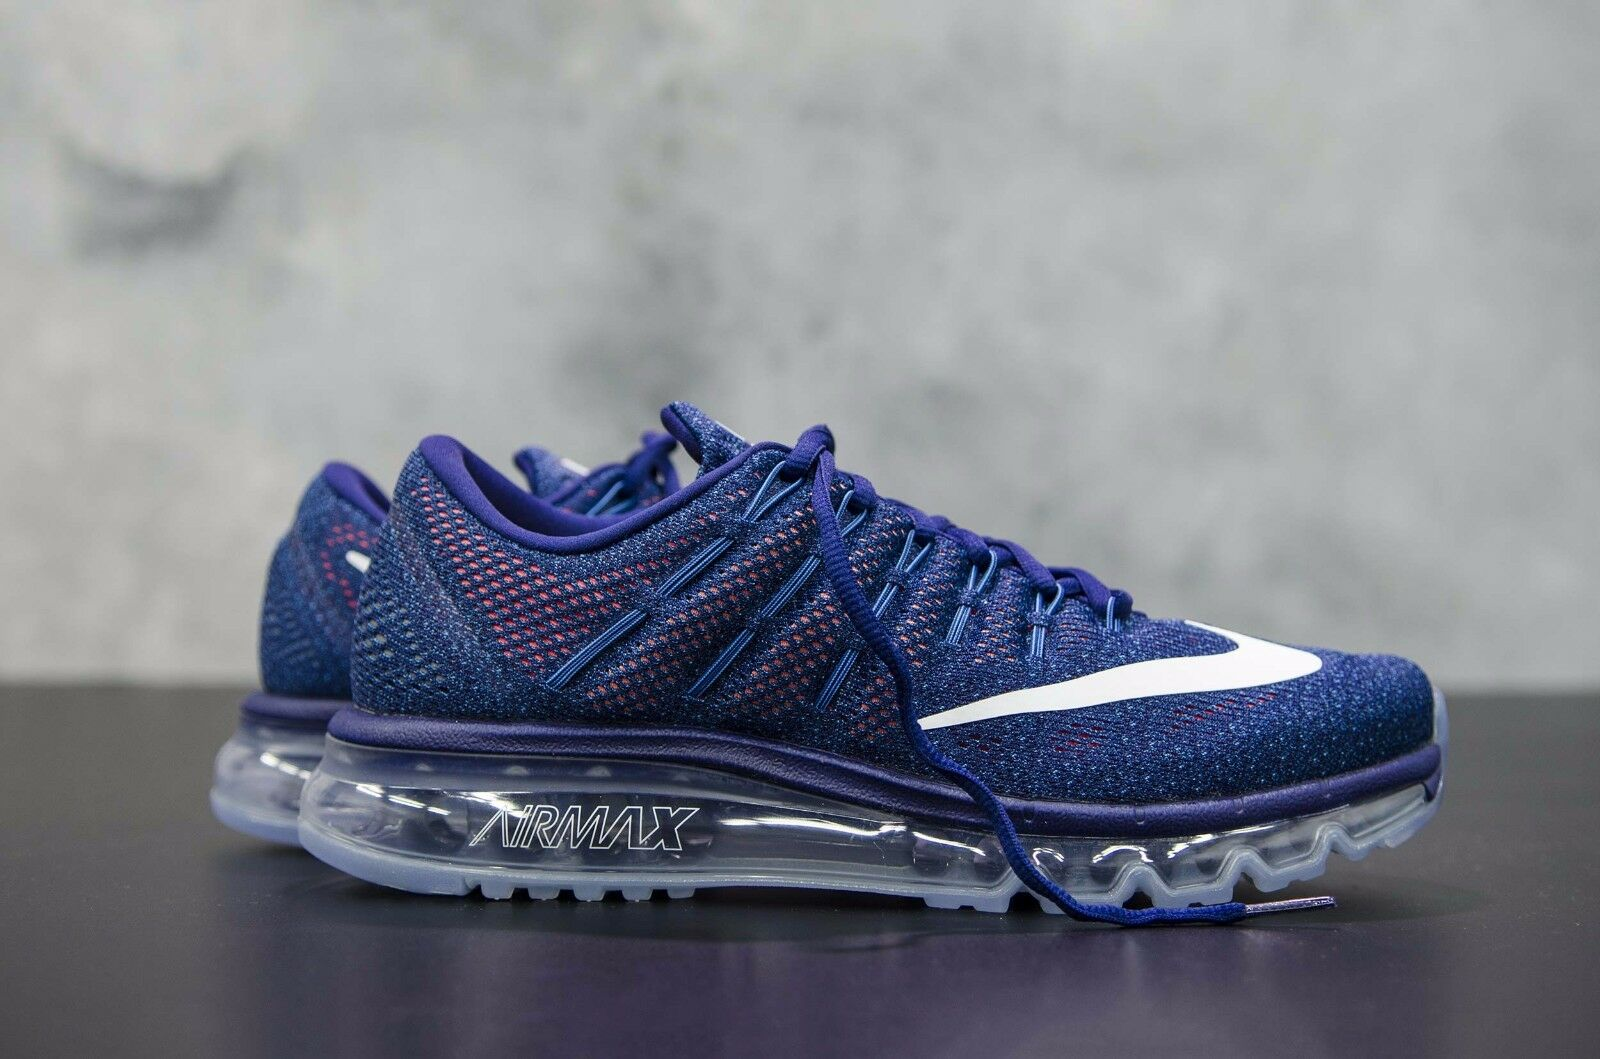 Nike Air Max 2016 806771-411 Loyal Blue / Summit White Hombres Sz 8